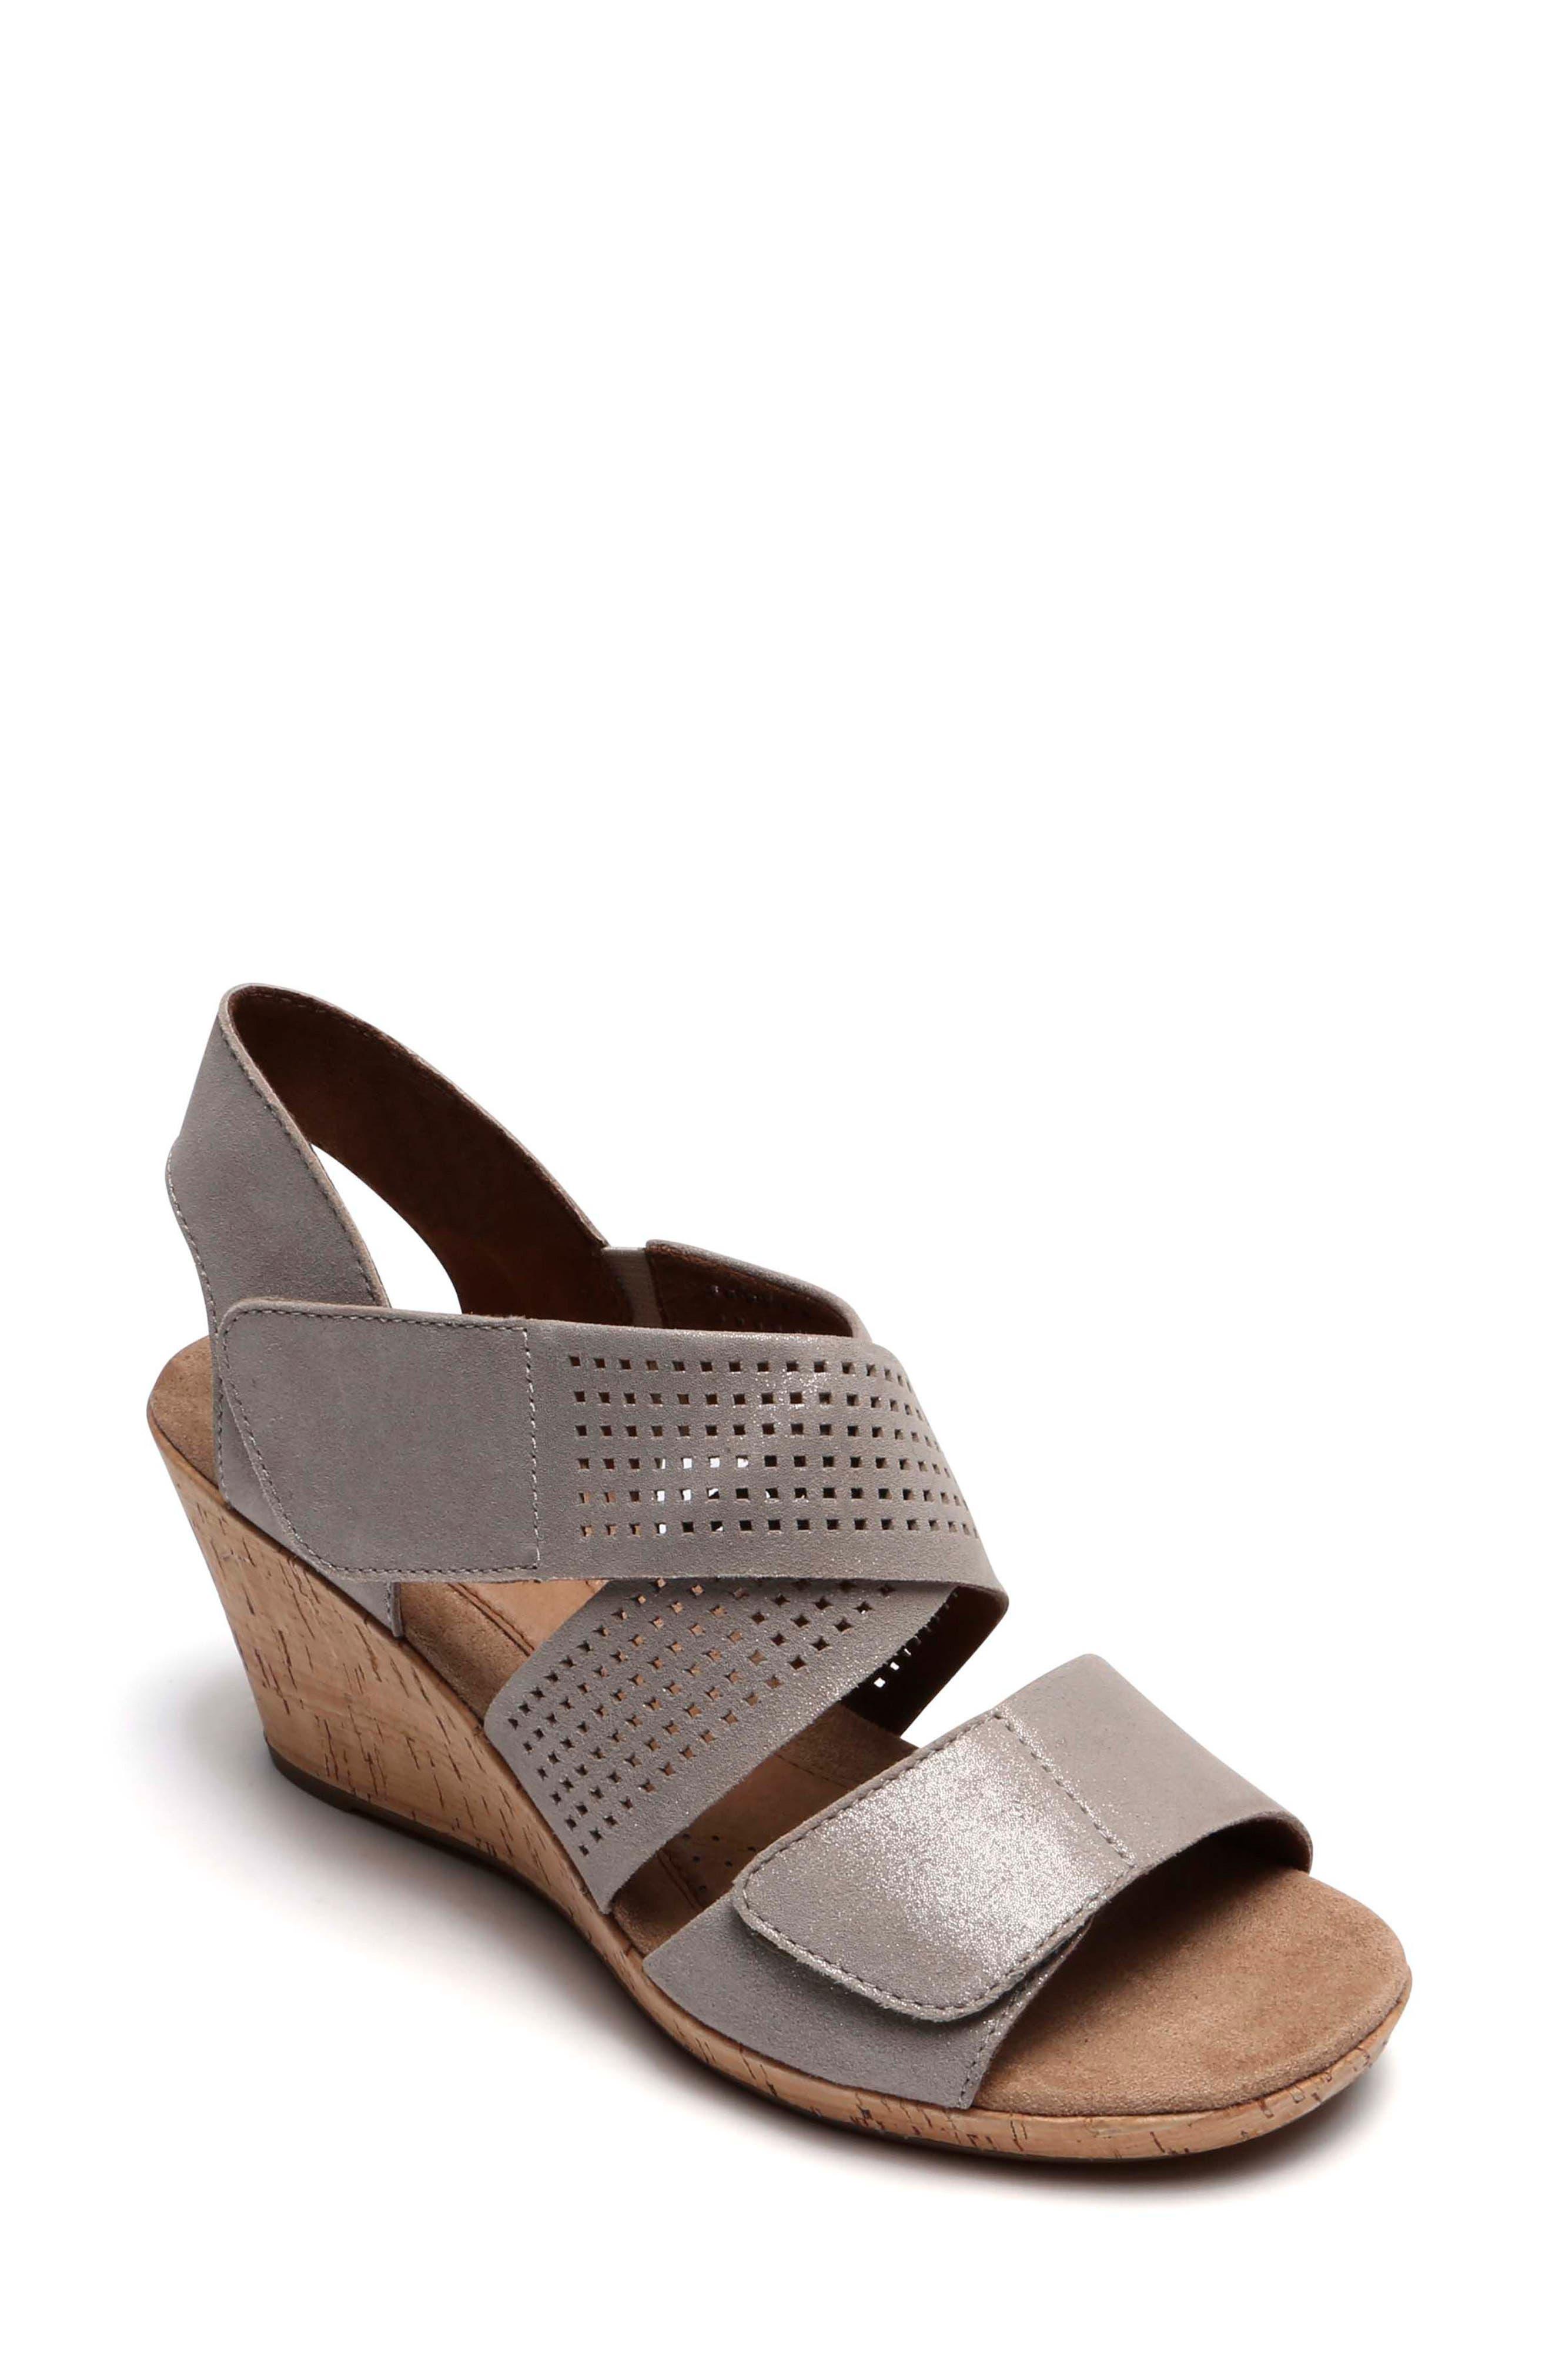 Janna Cross Strap Wedge Sandal,                             Main thumbnail 3, color,